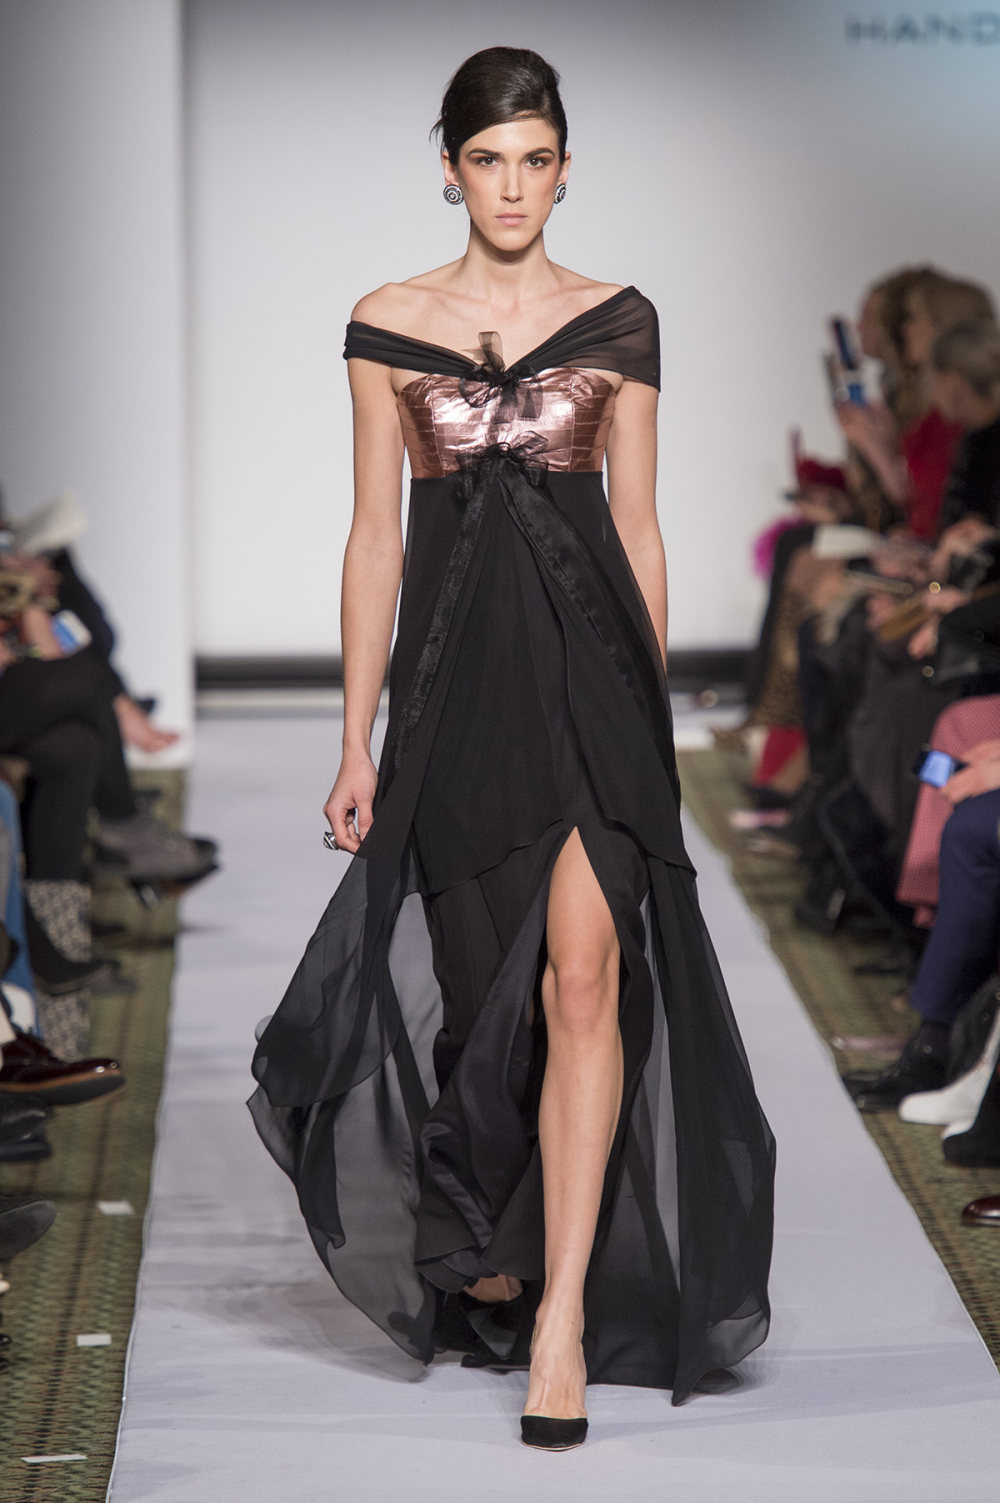 Carolina Herrera时装系列用鲜艳的颜色充满智能的黑白色调-44.jpg